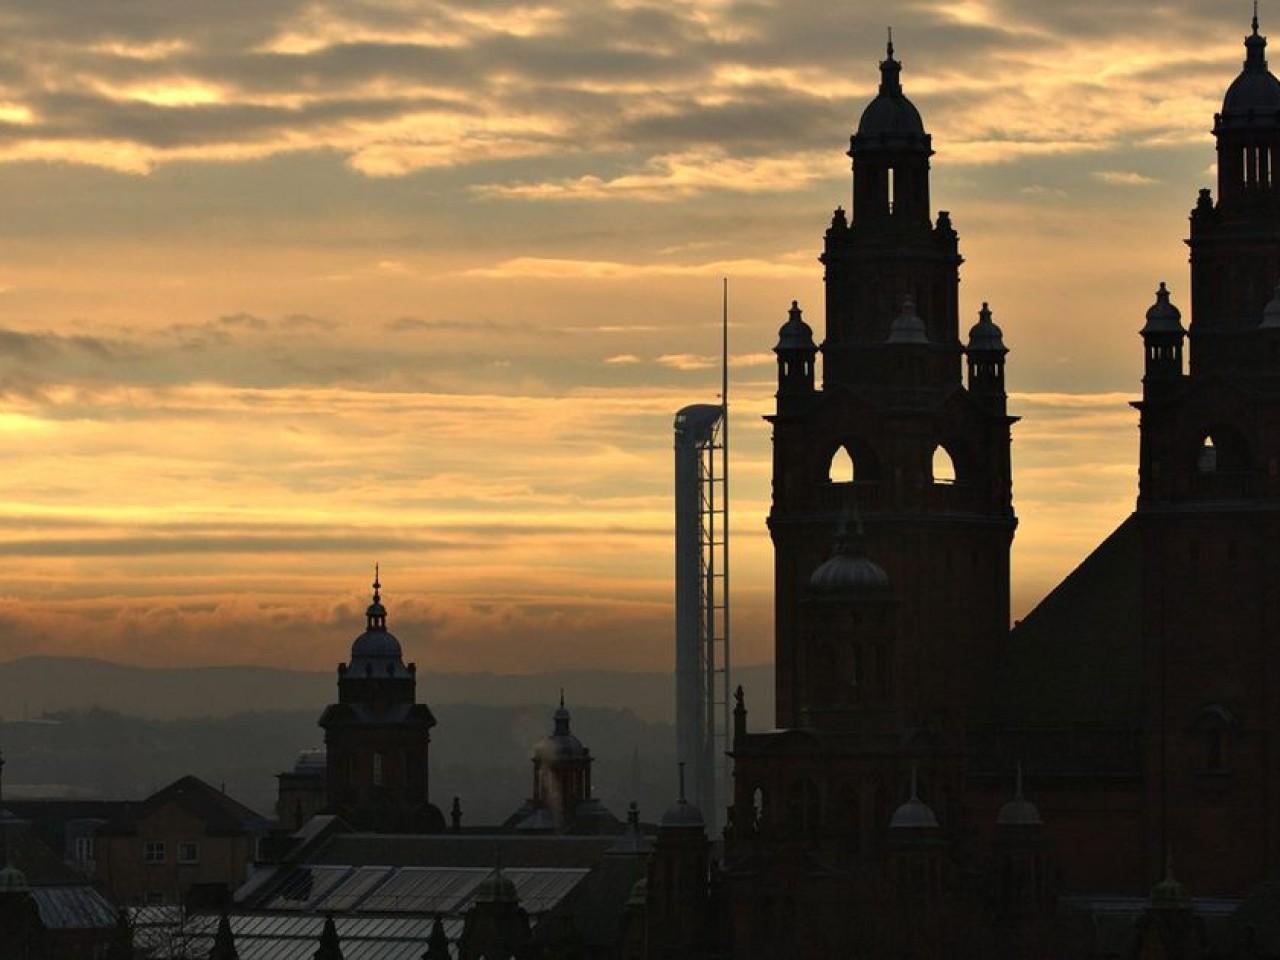 A Glasgow conference for 600 delegates